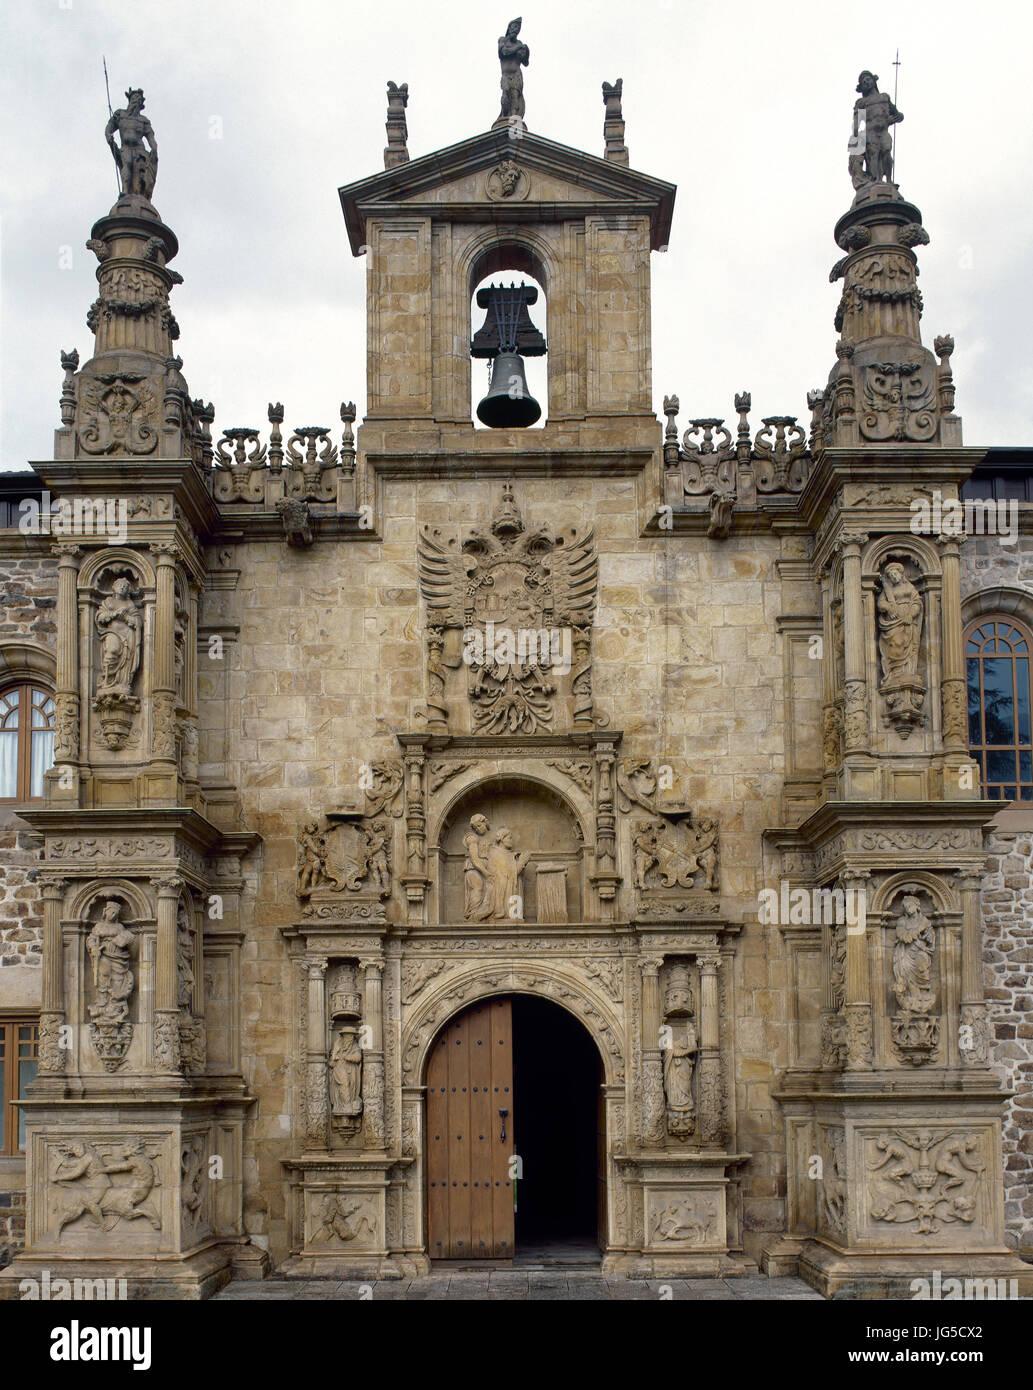 University of the Holy Spirit (Sancti Spiritus). Facade. Onate. Guipuzkoa, Spain. - Stock Image